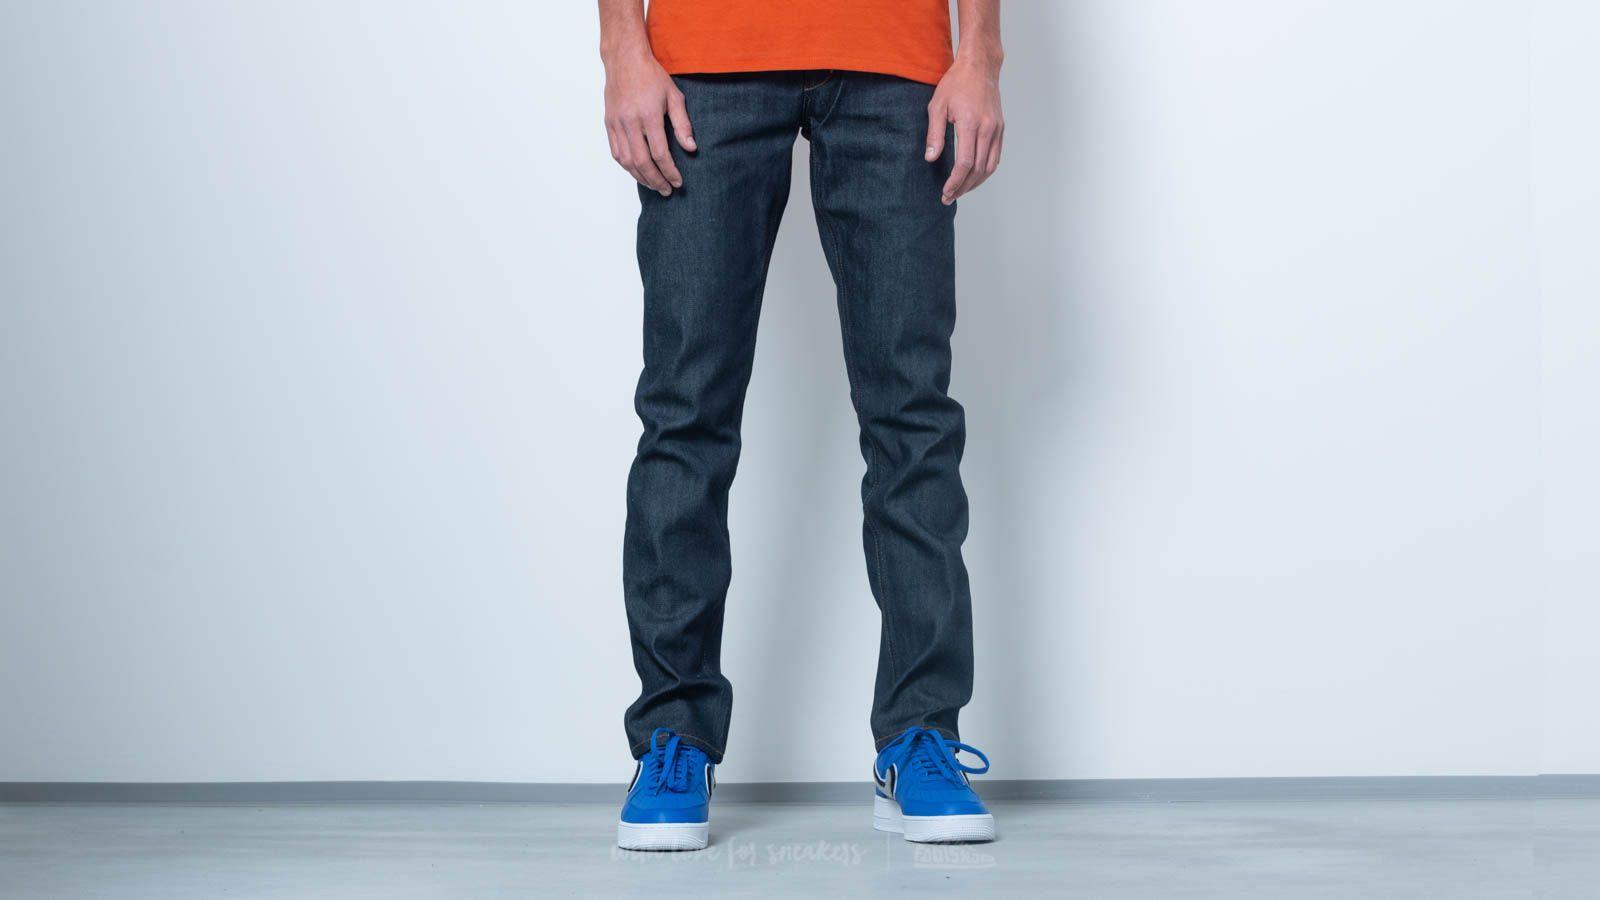 Junk de Luxe Jeans Blue/ Indigo za skvelú cenu 81 € kúpite na Footshop.sk